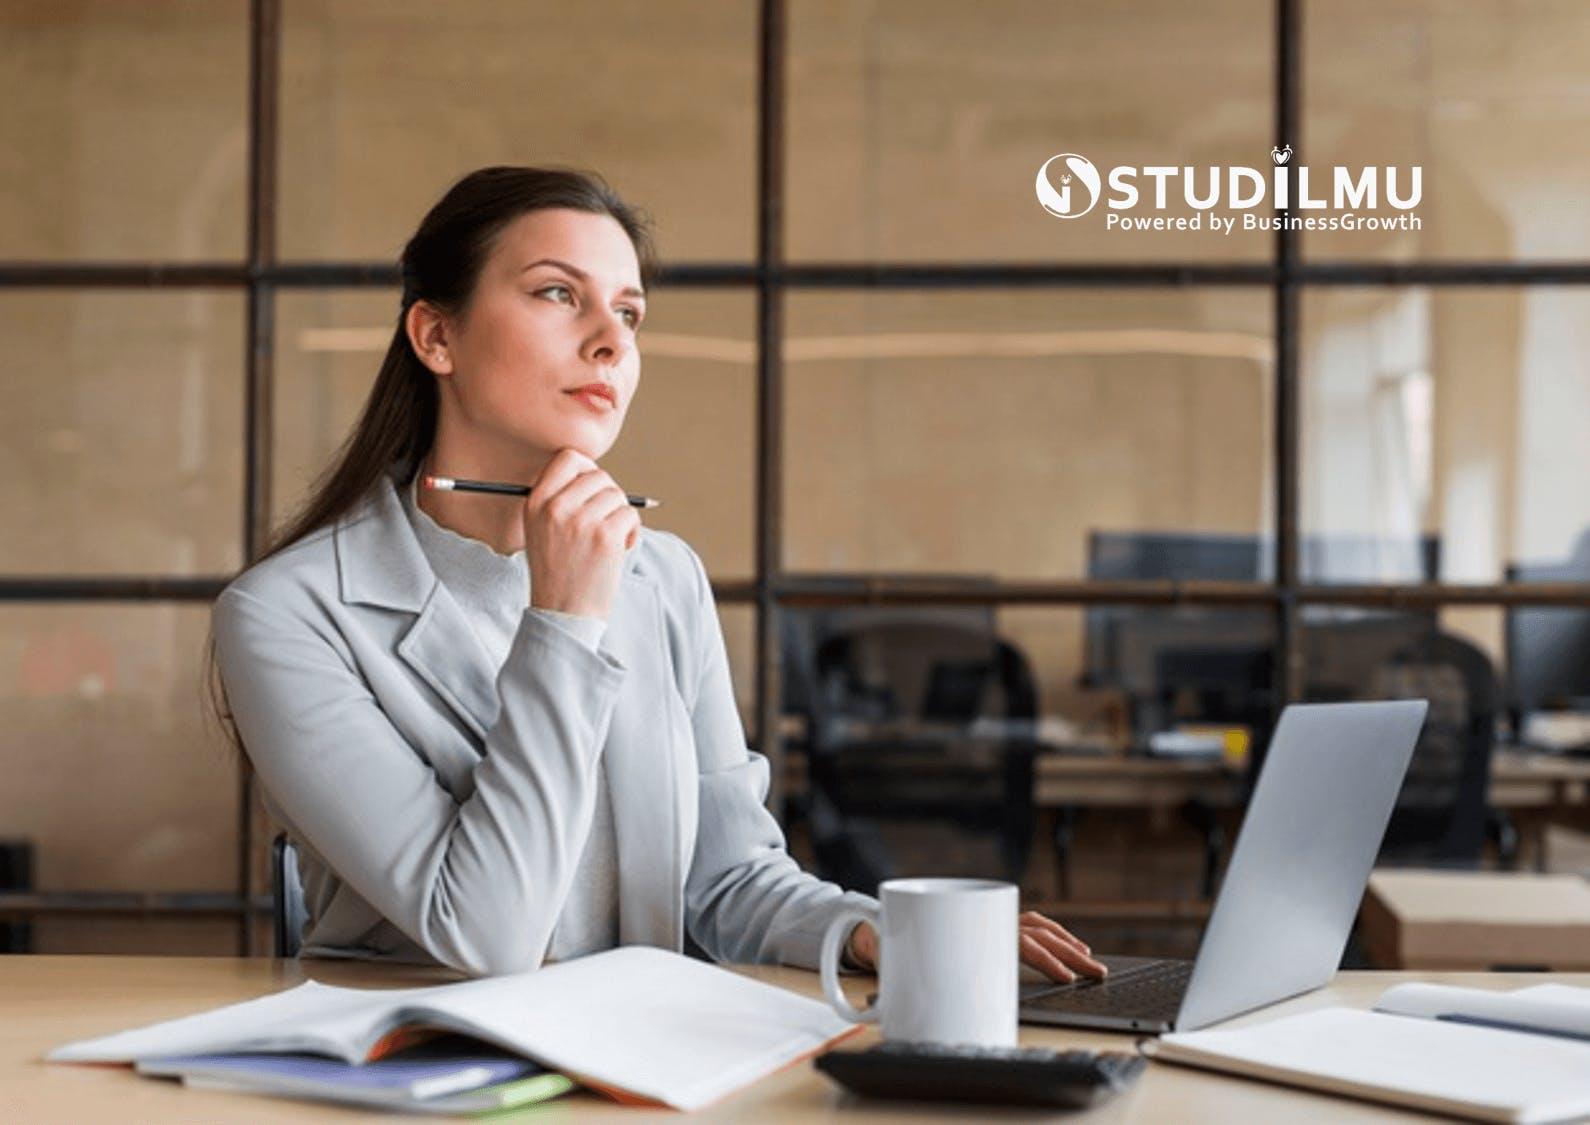 STUDILMU Career Advice - 5 Mindset untuk Menjadi Pengusaha Kaya